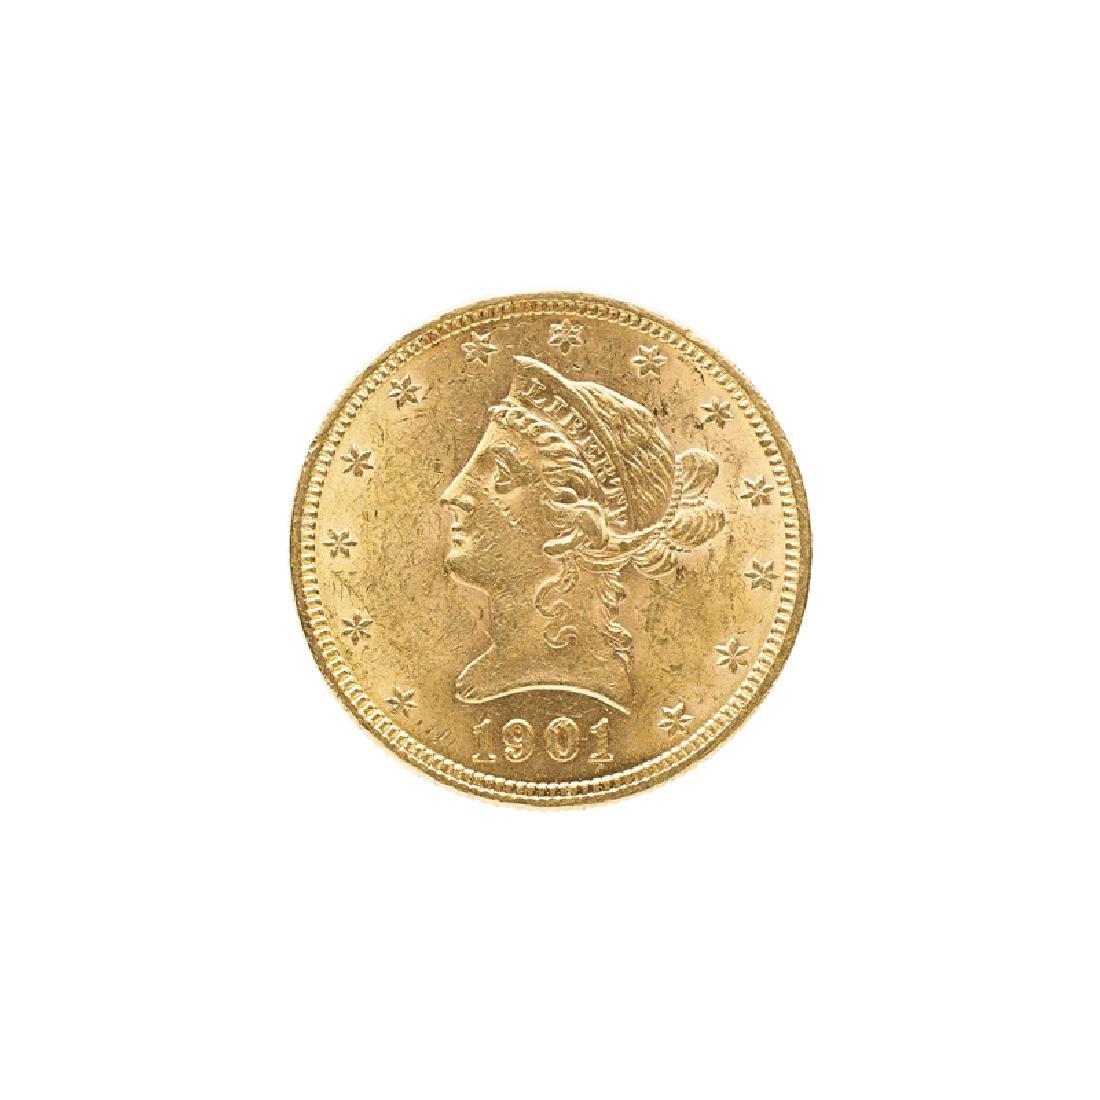 1901 $10.00 LIBERTY HEAD GOLD COIN